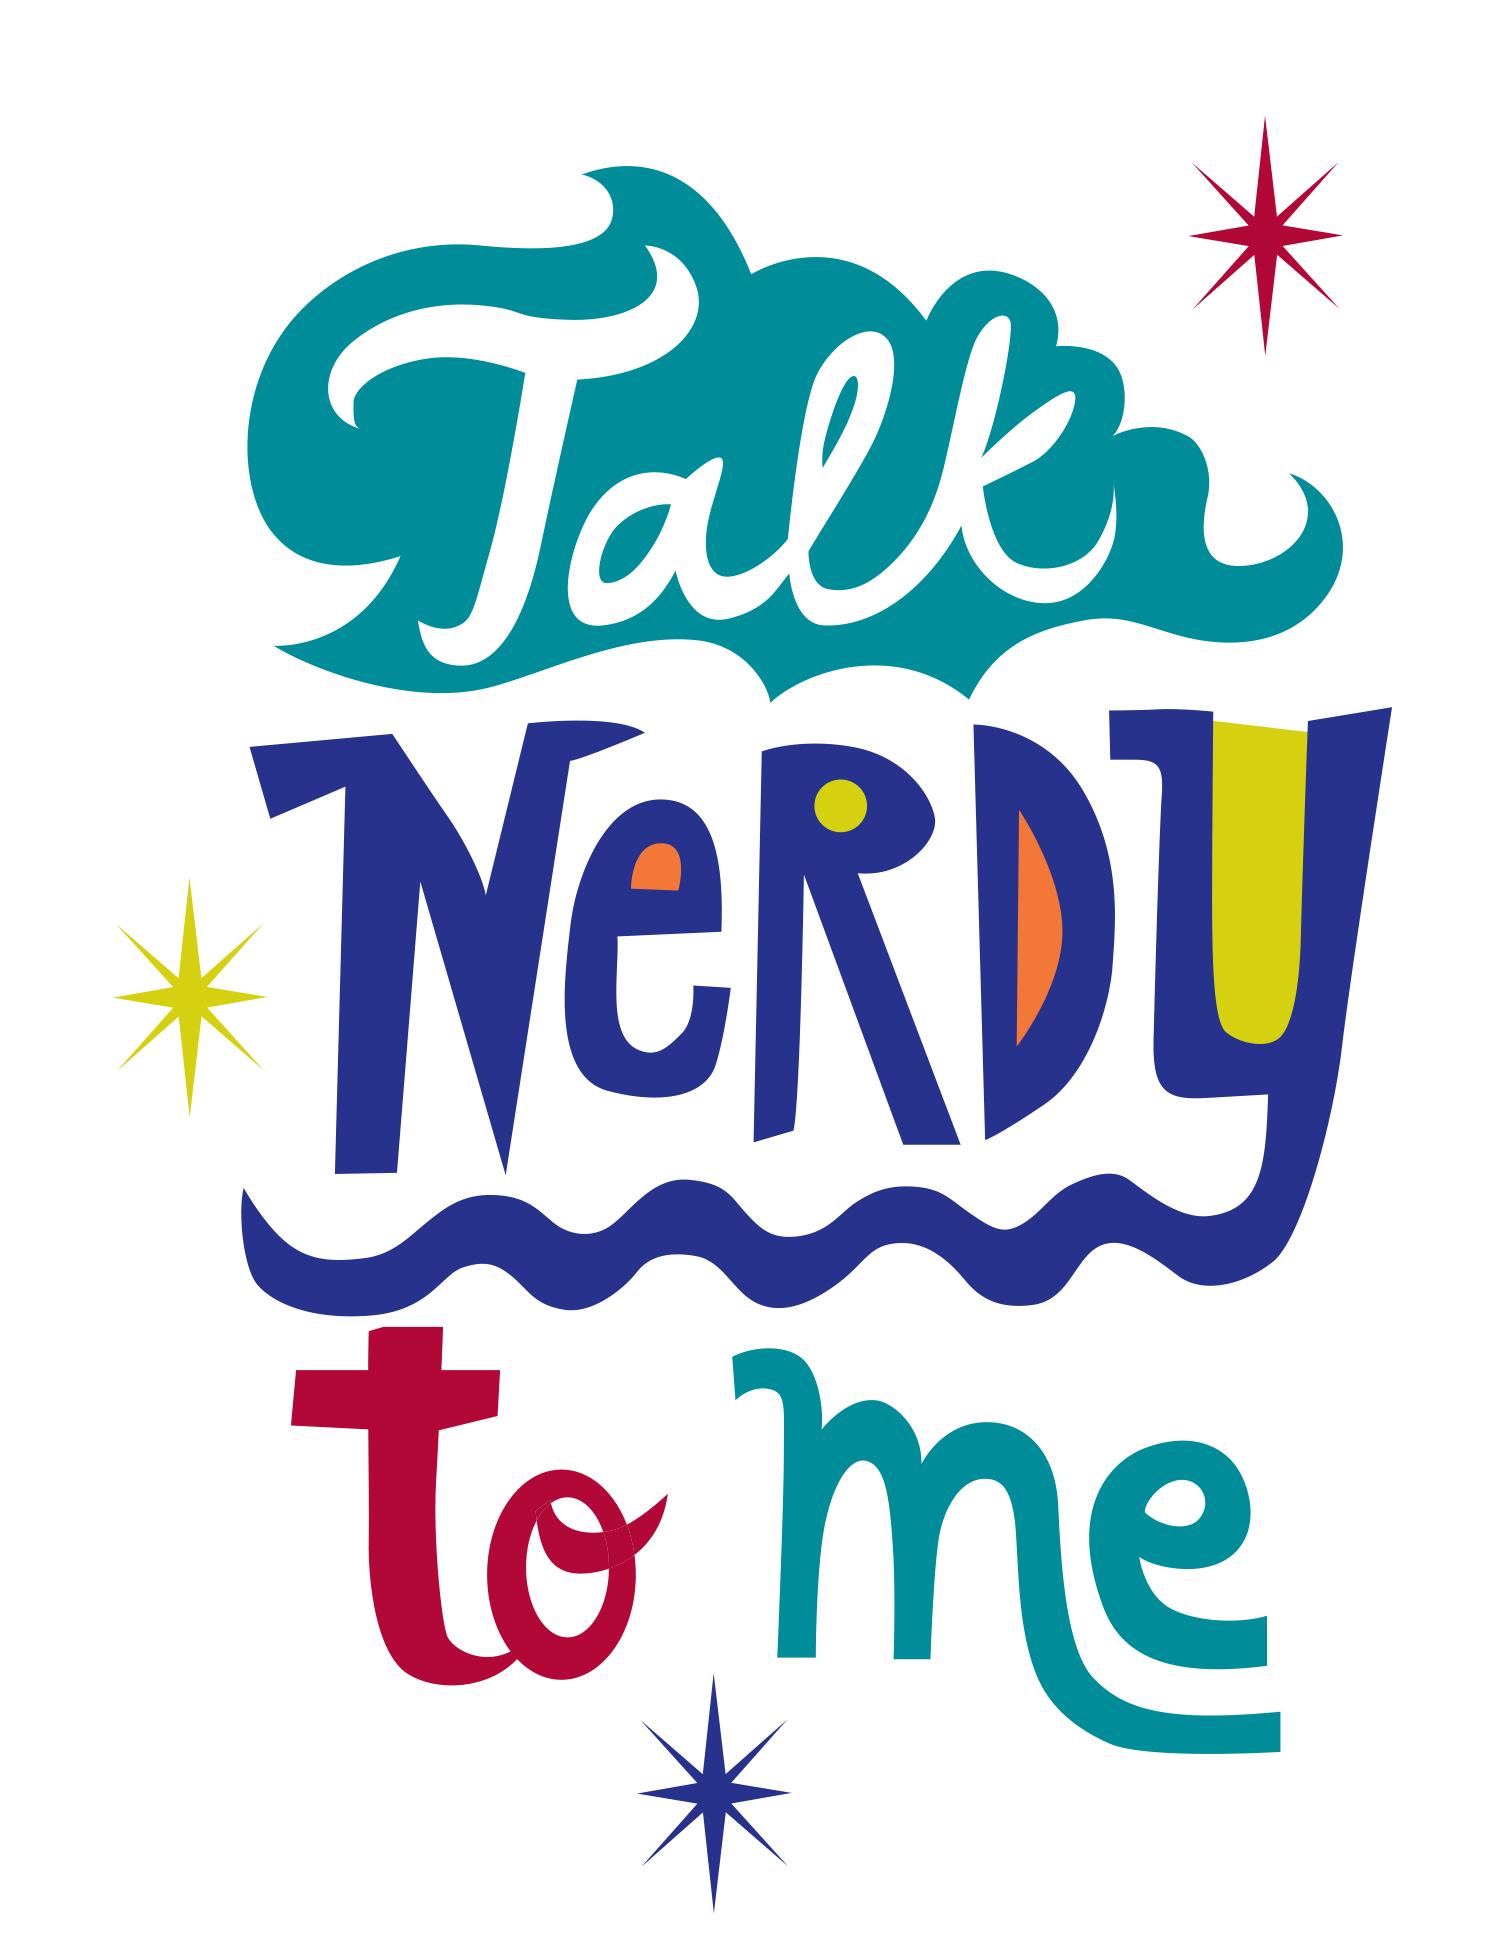 talk_nerdy_to_me_type_andi_bird.png